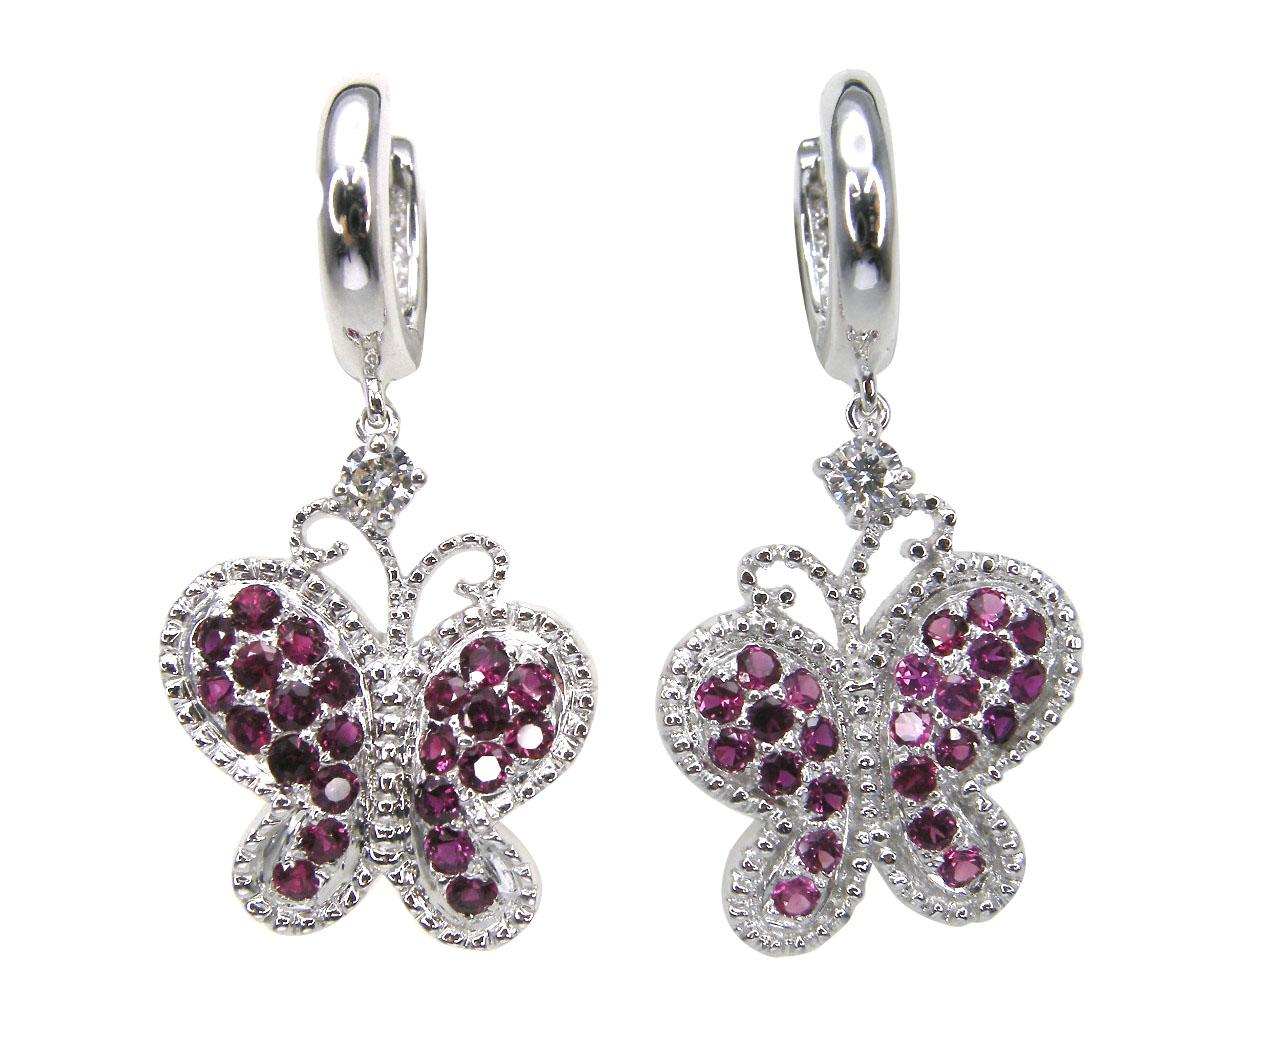 SIGNATURE RUBY BUTTERFLY EARRINGS CLUSTER DIAMOND PENDANT BESPOKE FINE JEWELLERY BY SHAHINA HATTA